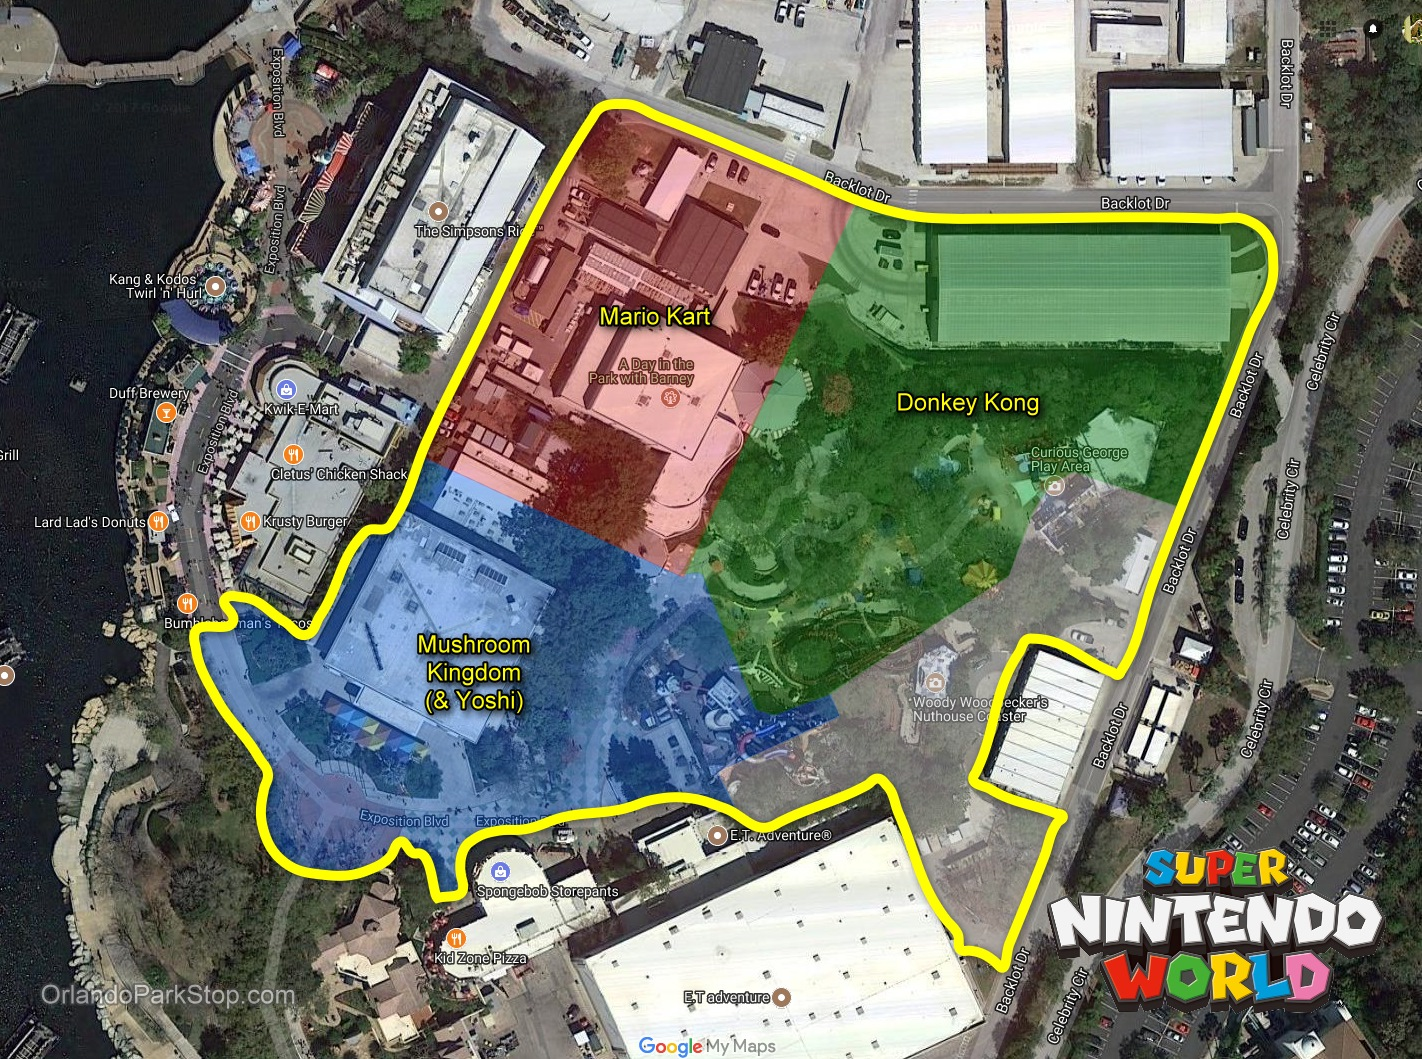 Disney World Park Layout